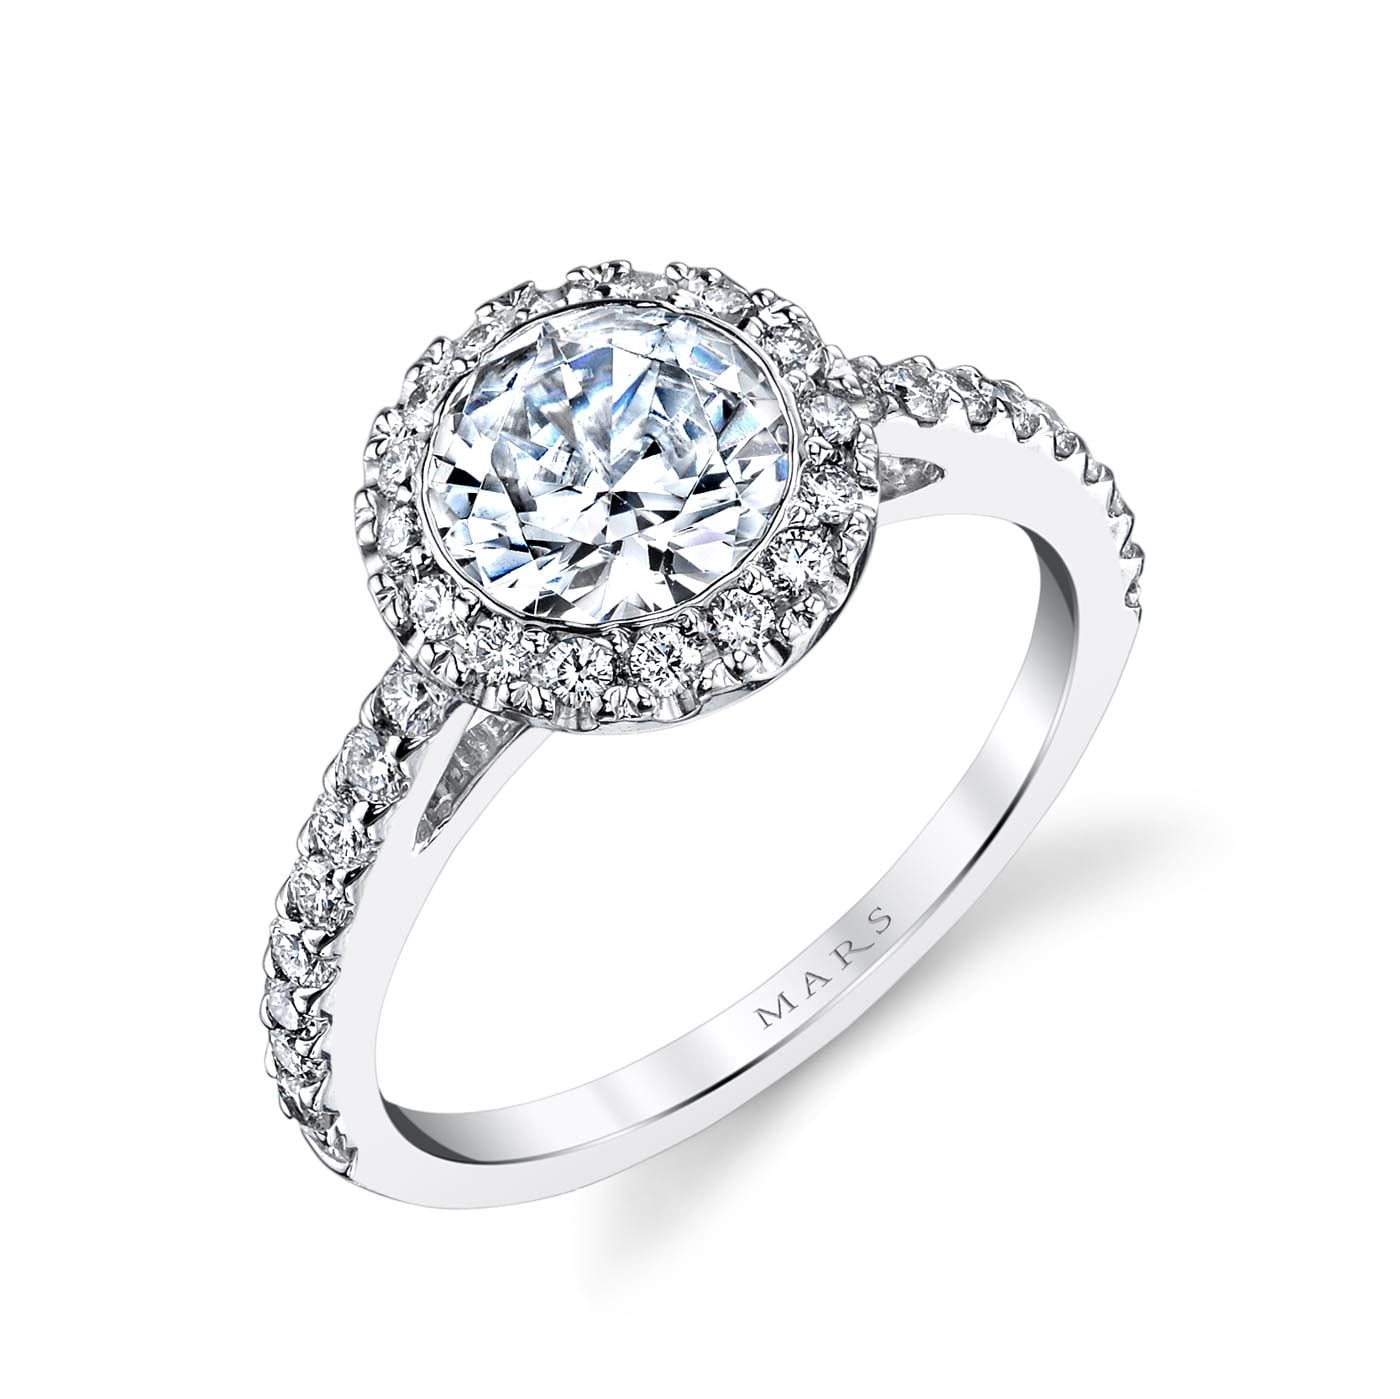 Halo Engagement RingStyle #: MARS 13813